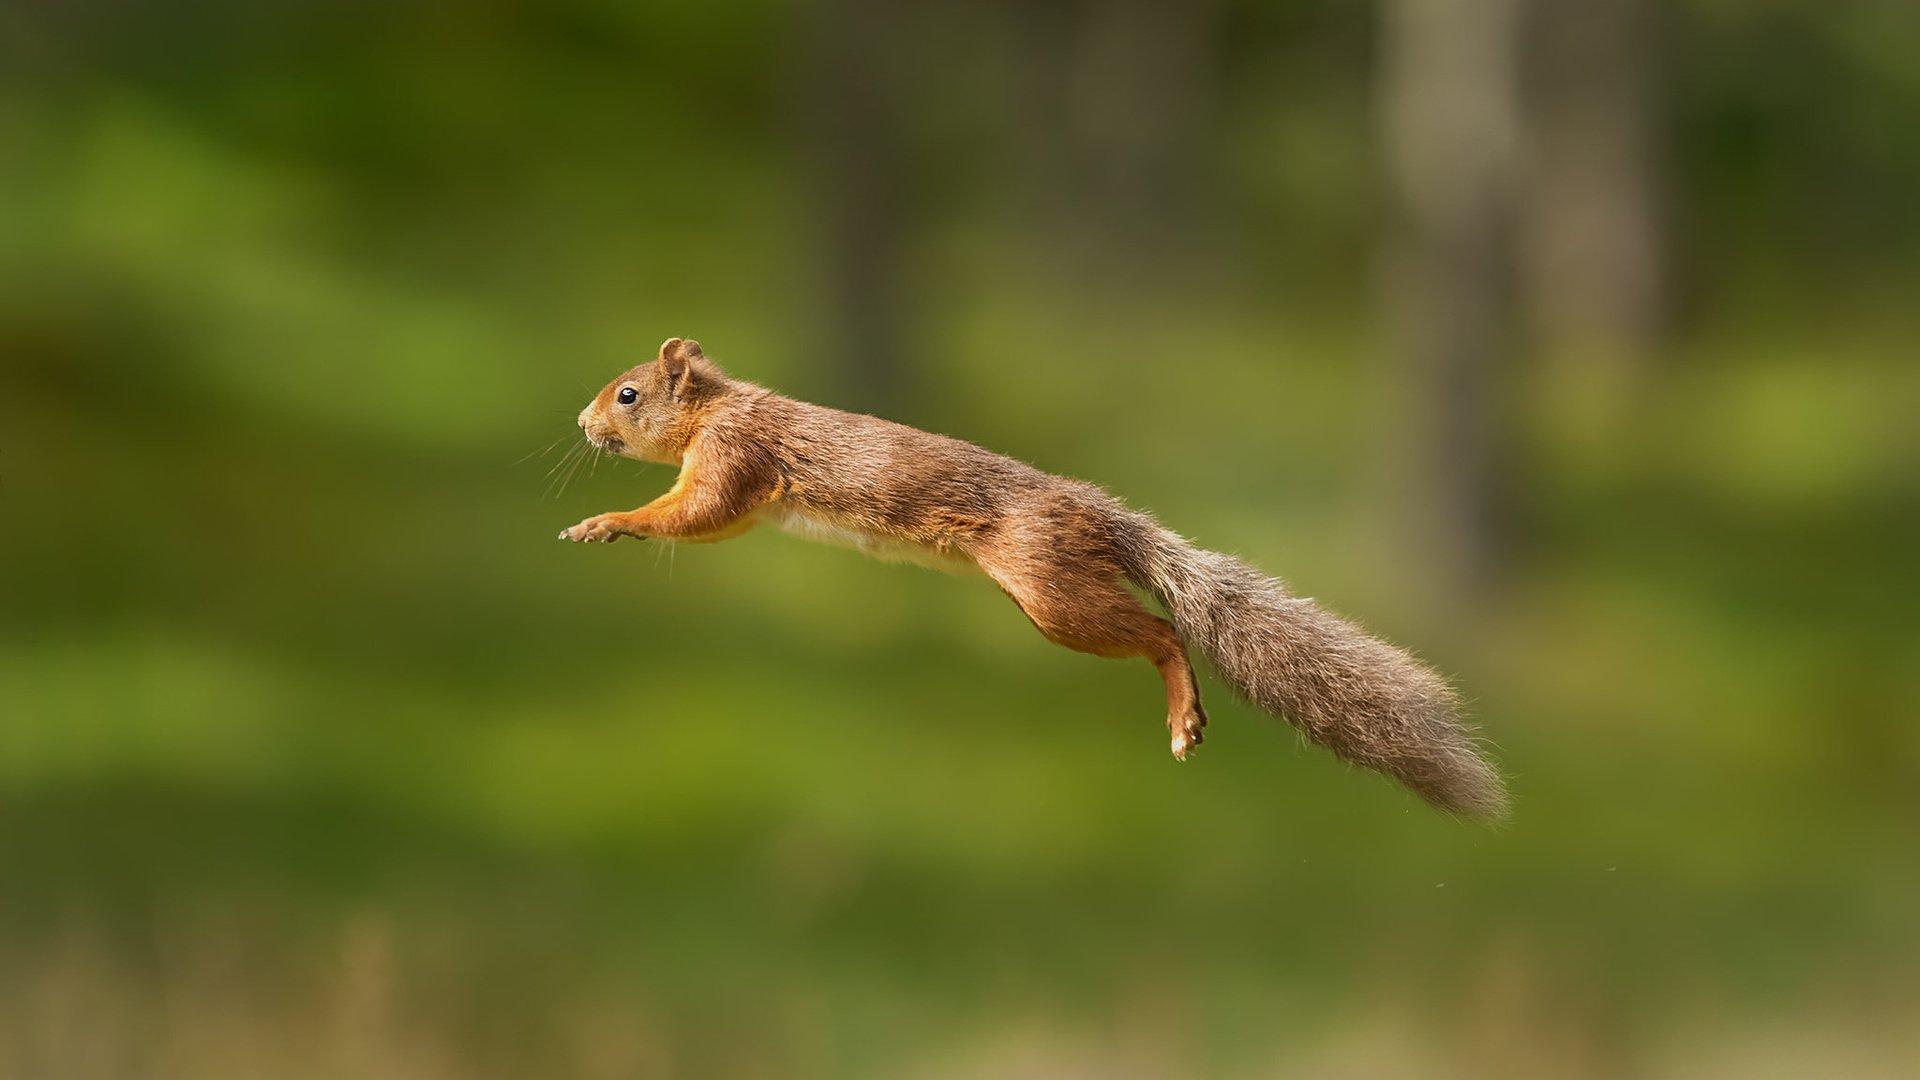 Flying Squirrels - Biology, nesting behavior - Sialis Photos of flying squirrels